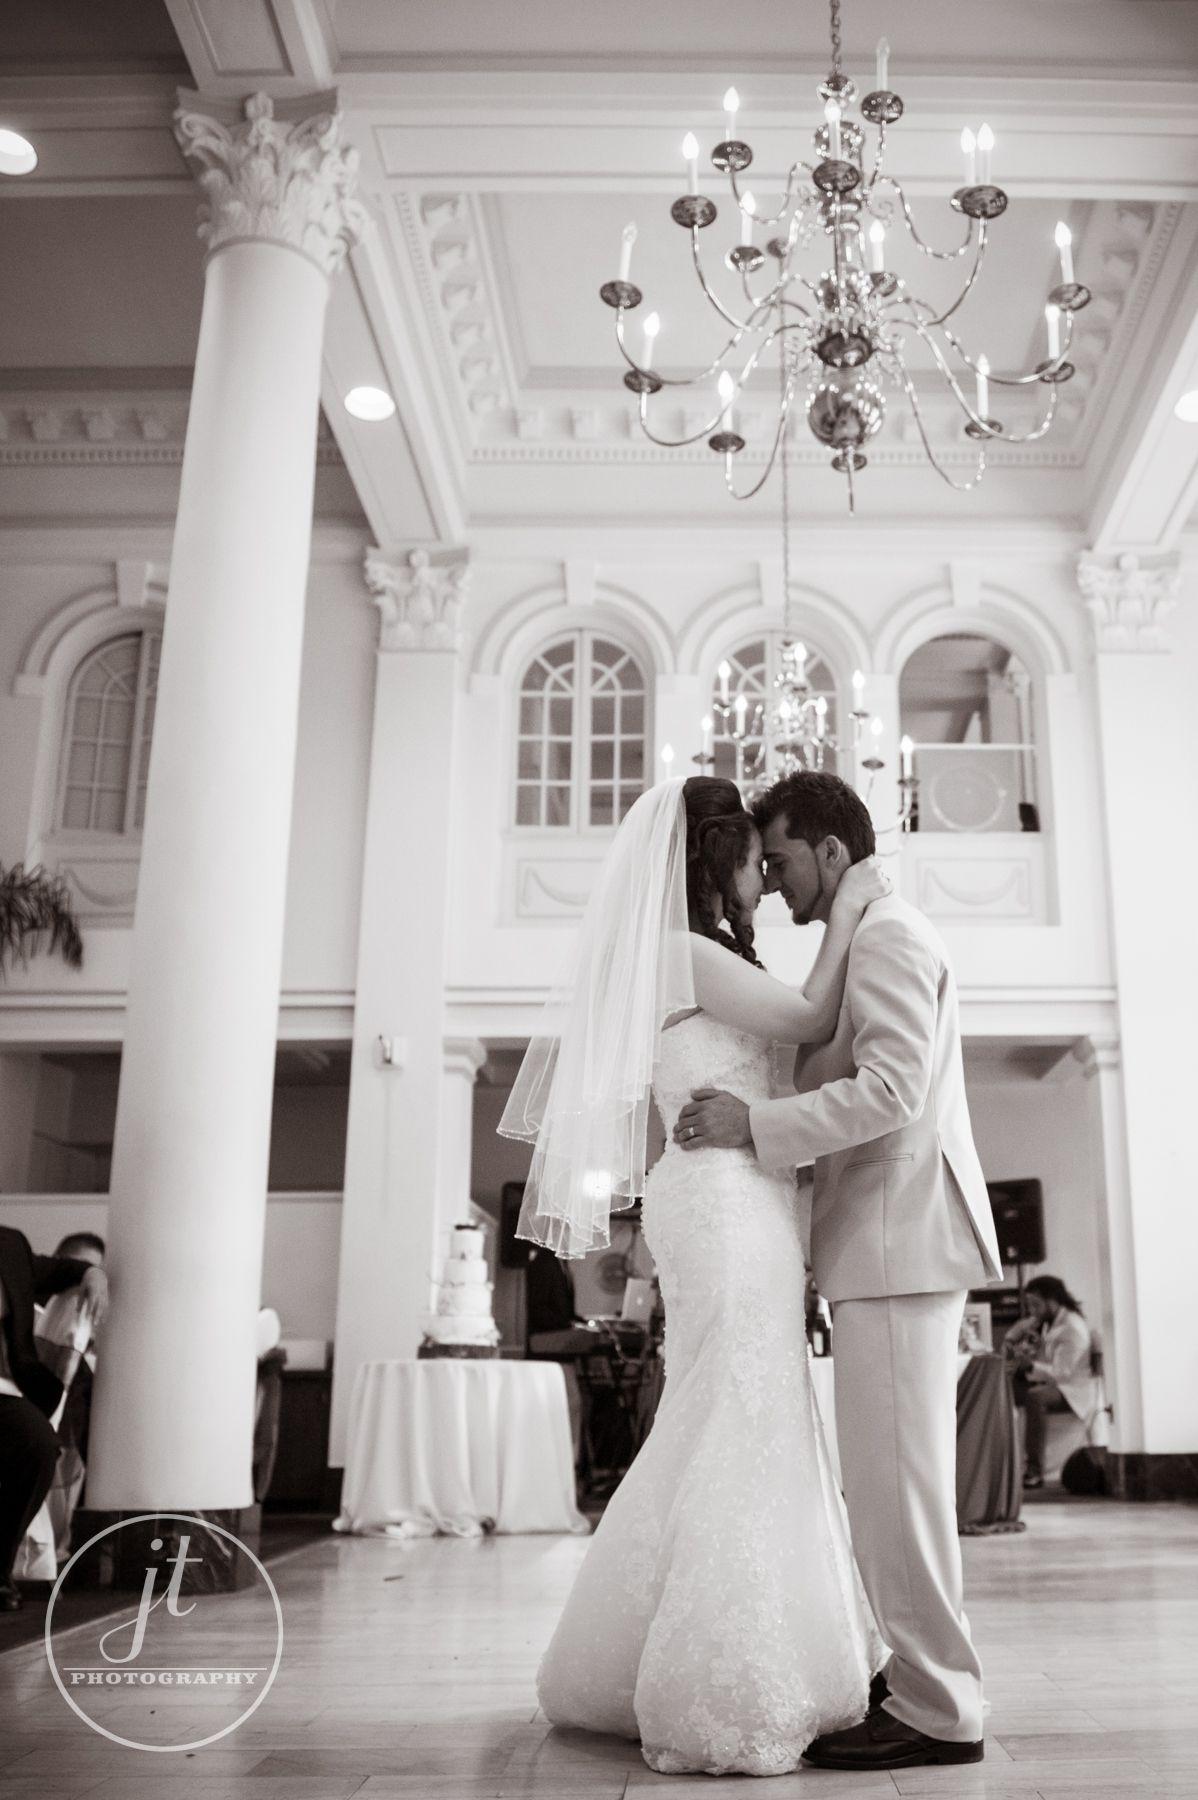 Concord Wedding Center.Piedmont Renaissance Center Wedding Concord Nc Concord North